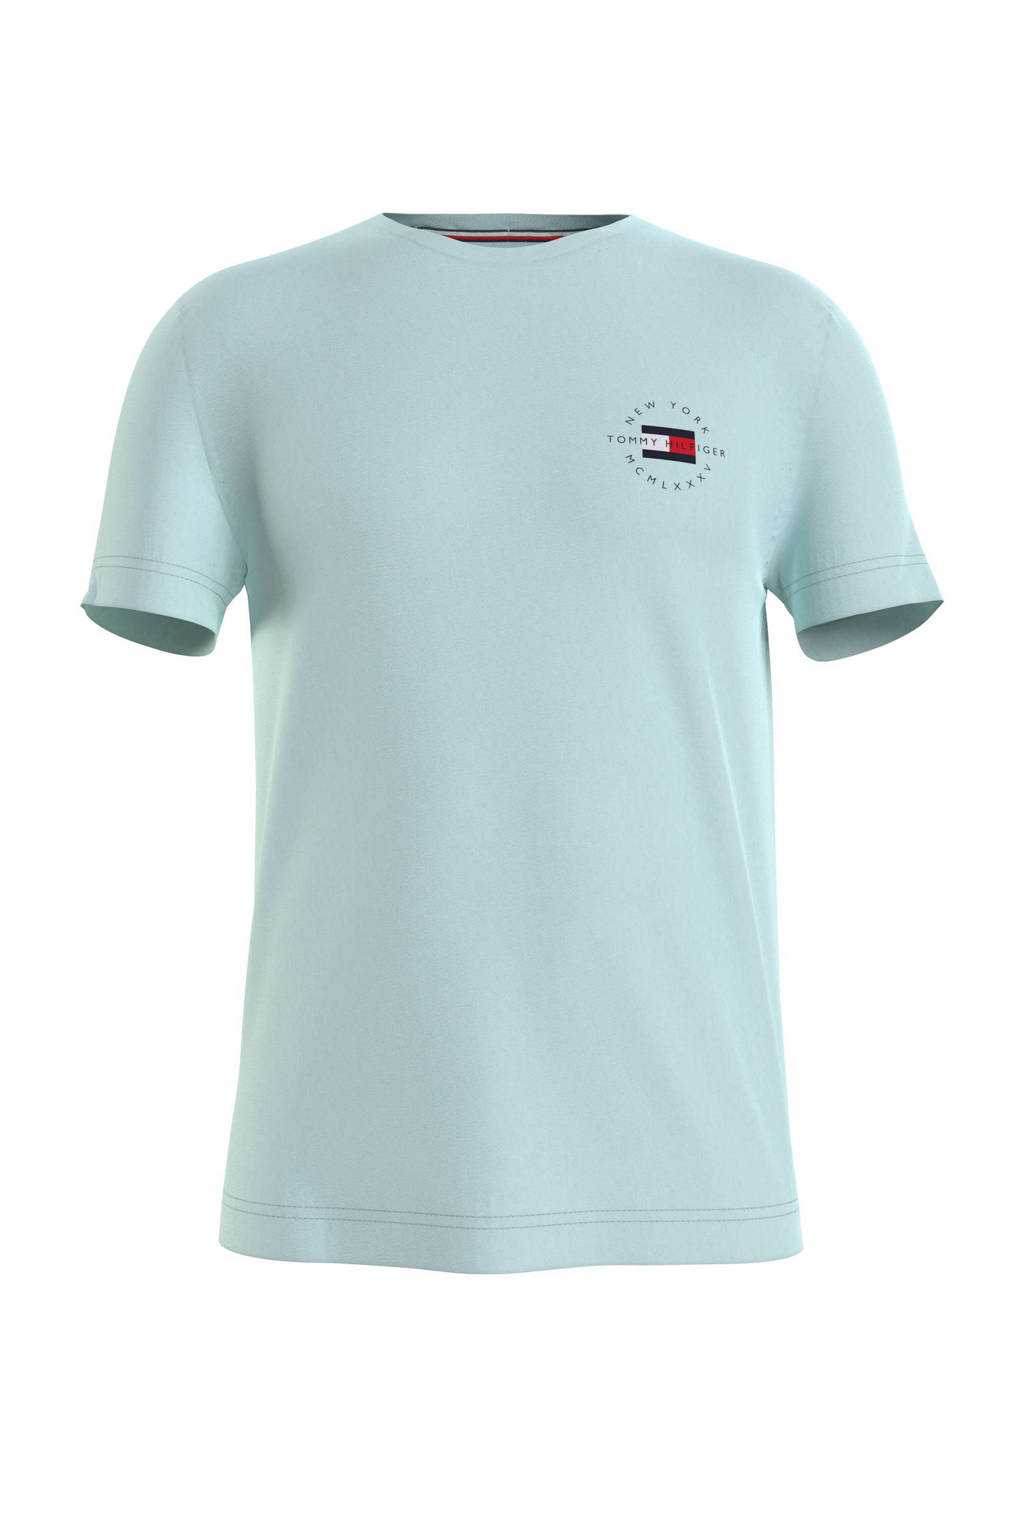 Tommy Hilfiger T-shirt van biologisch katoen mintgroen, Mintgroen